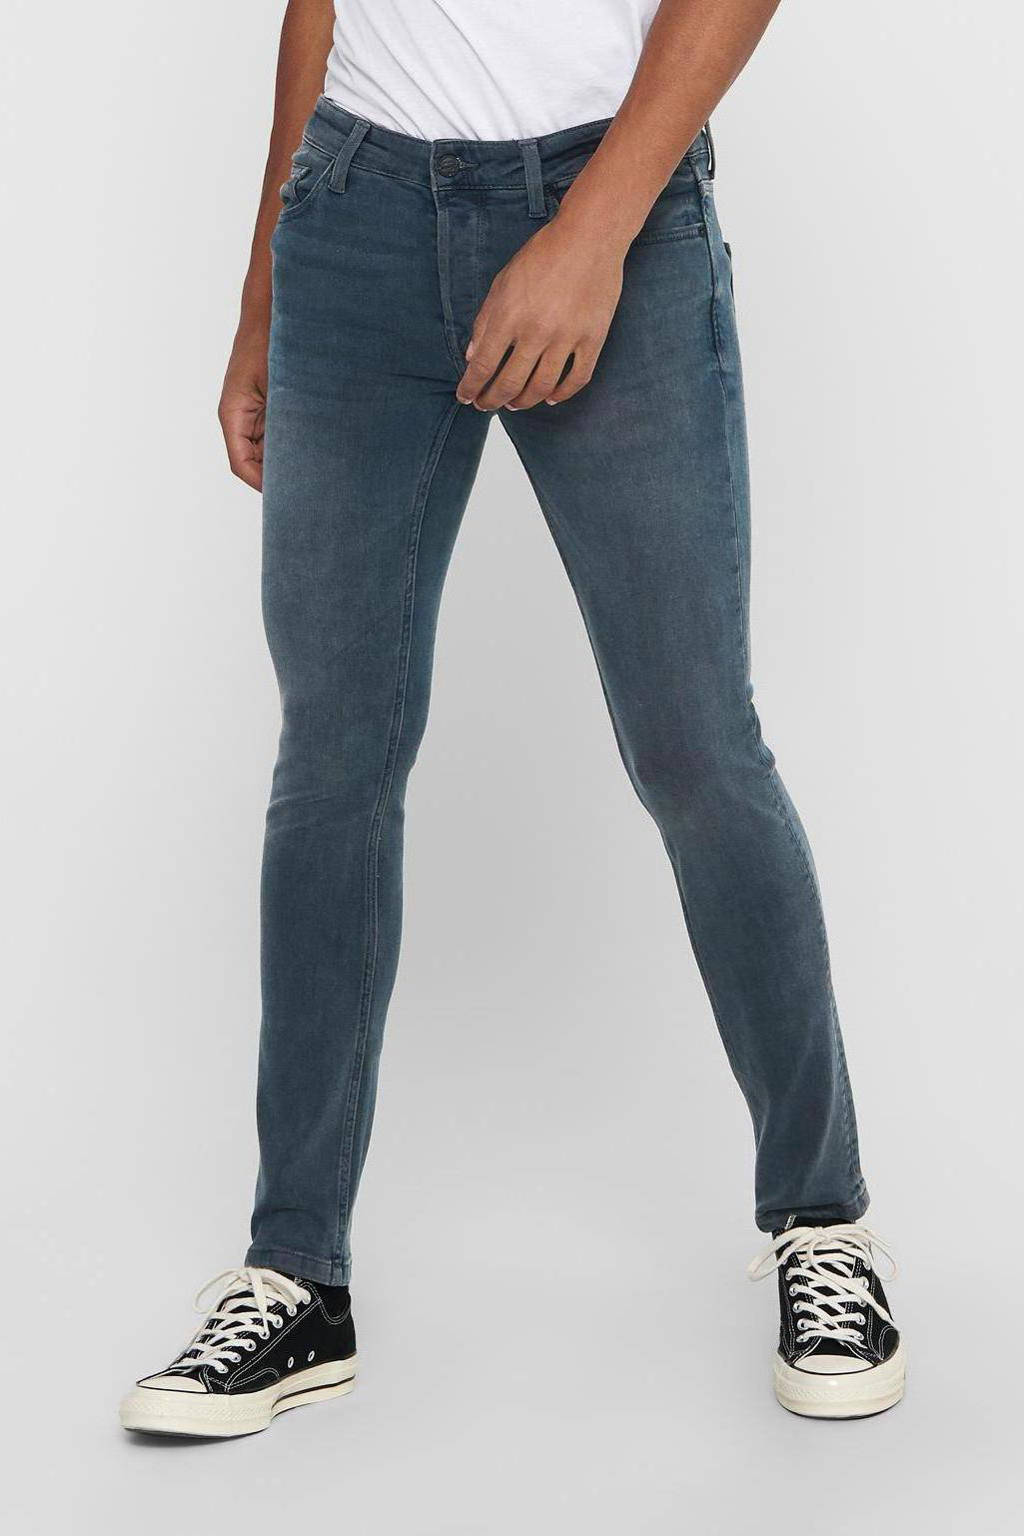 ONLY & SONS slim fit jeans ONSLOOM grijsblauw 7090, Grijsblauw 7090